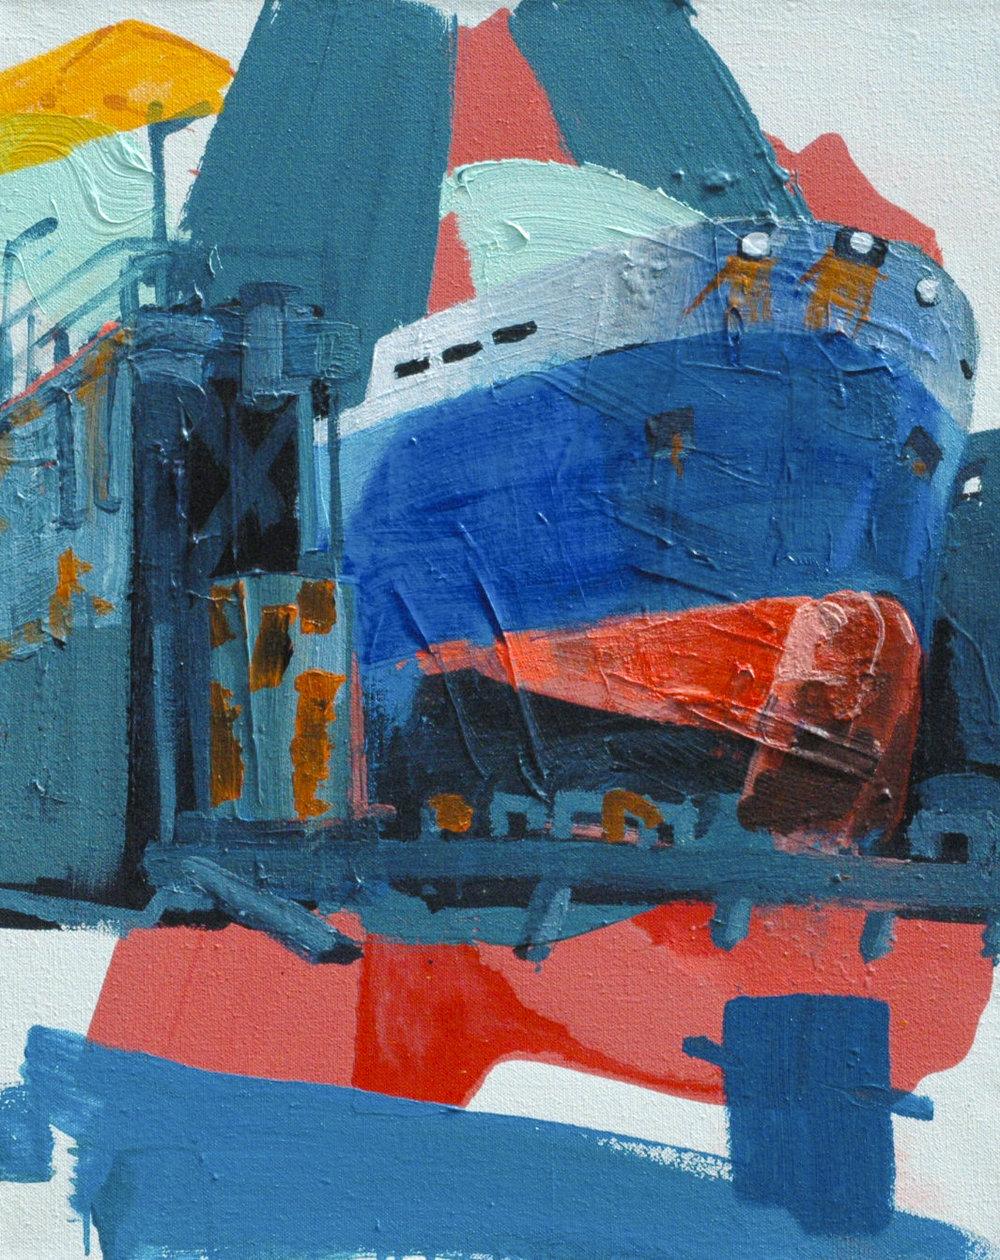 Rotterdam Drydock #2_80 x 65 cm_Acrylicpaint emulsion on Canvas_Hagens2015-2.jpg